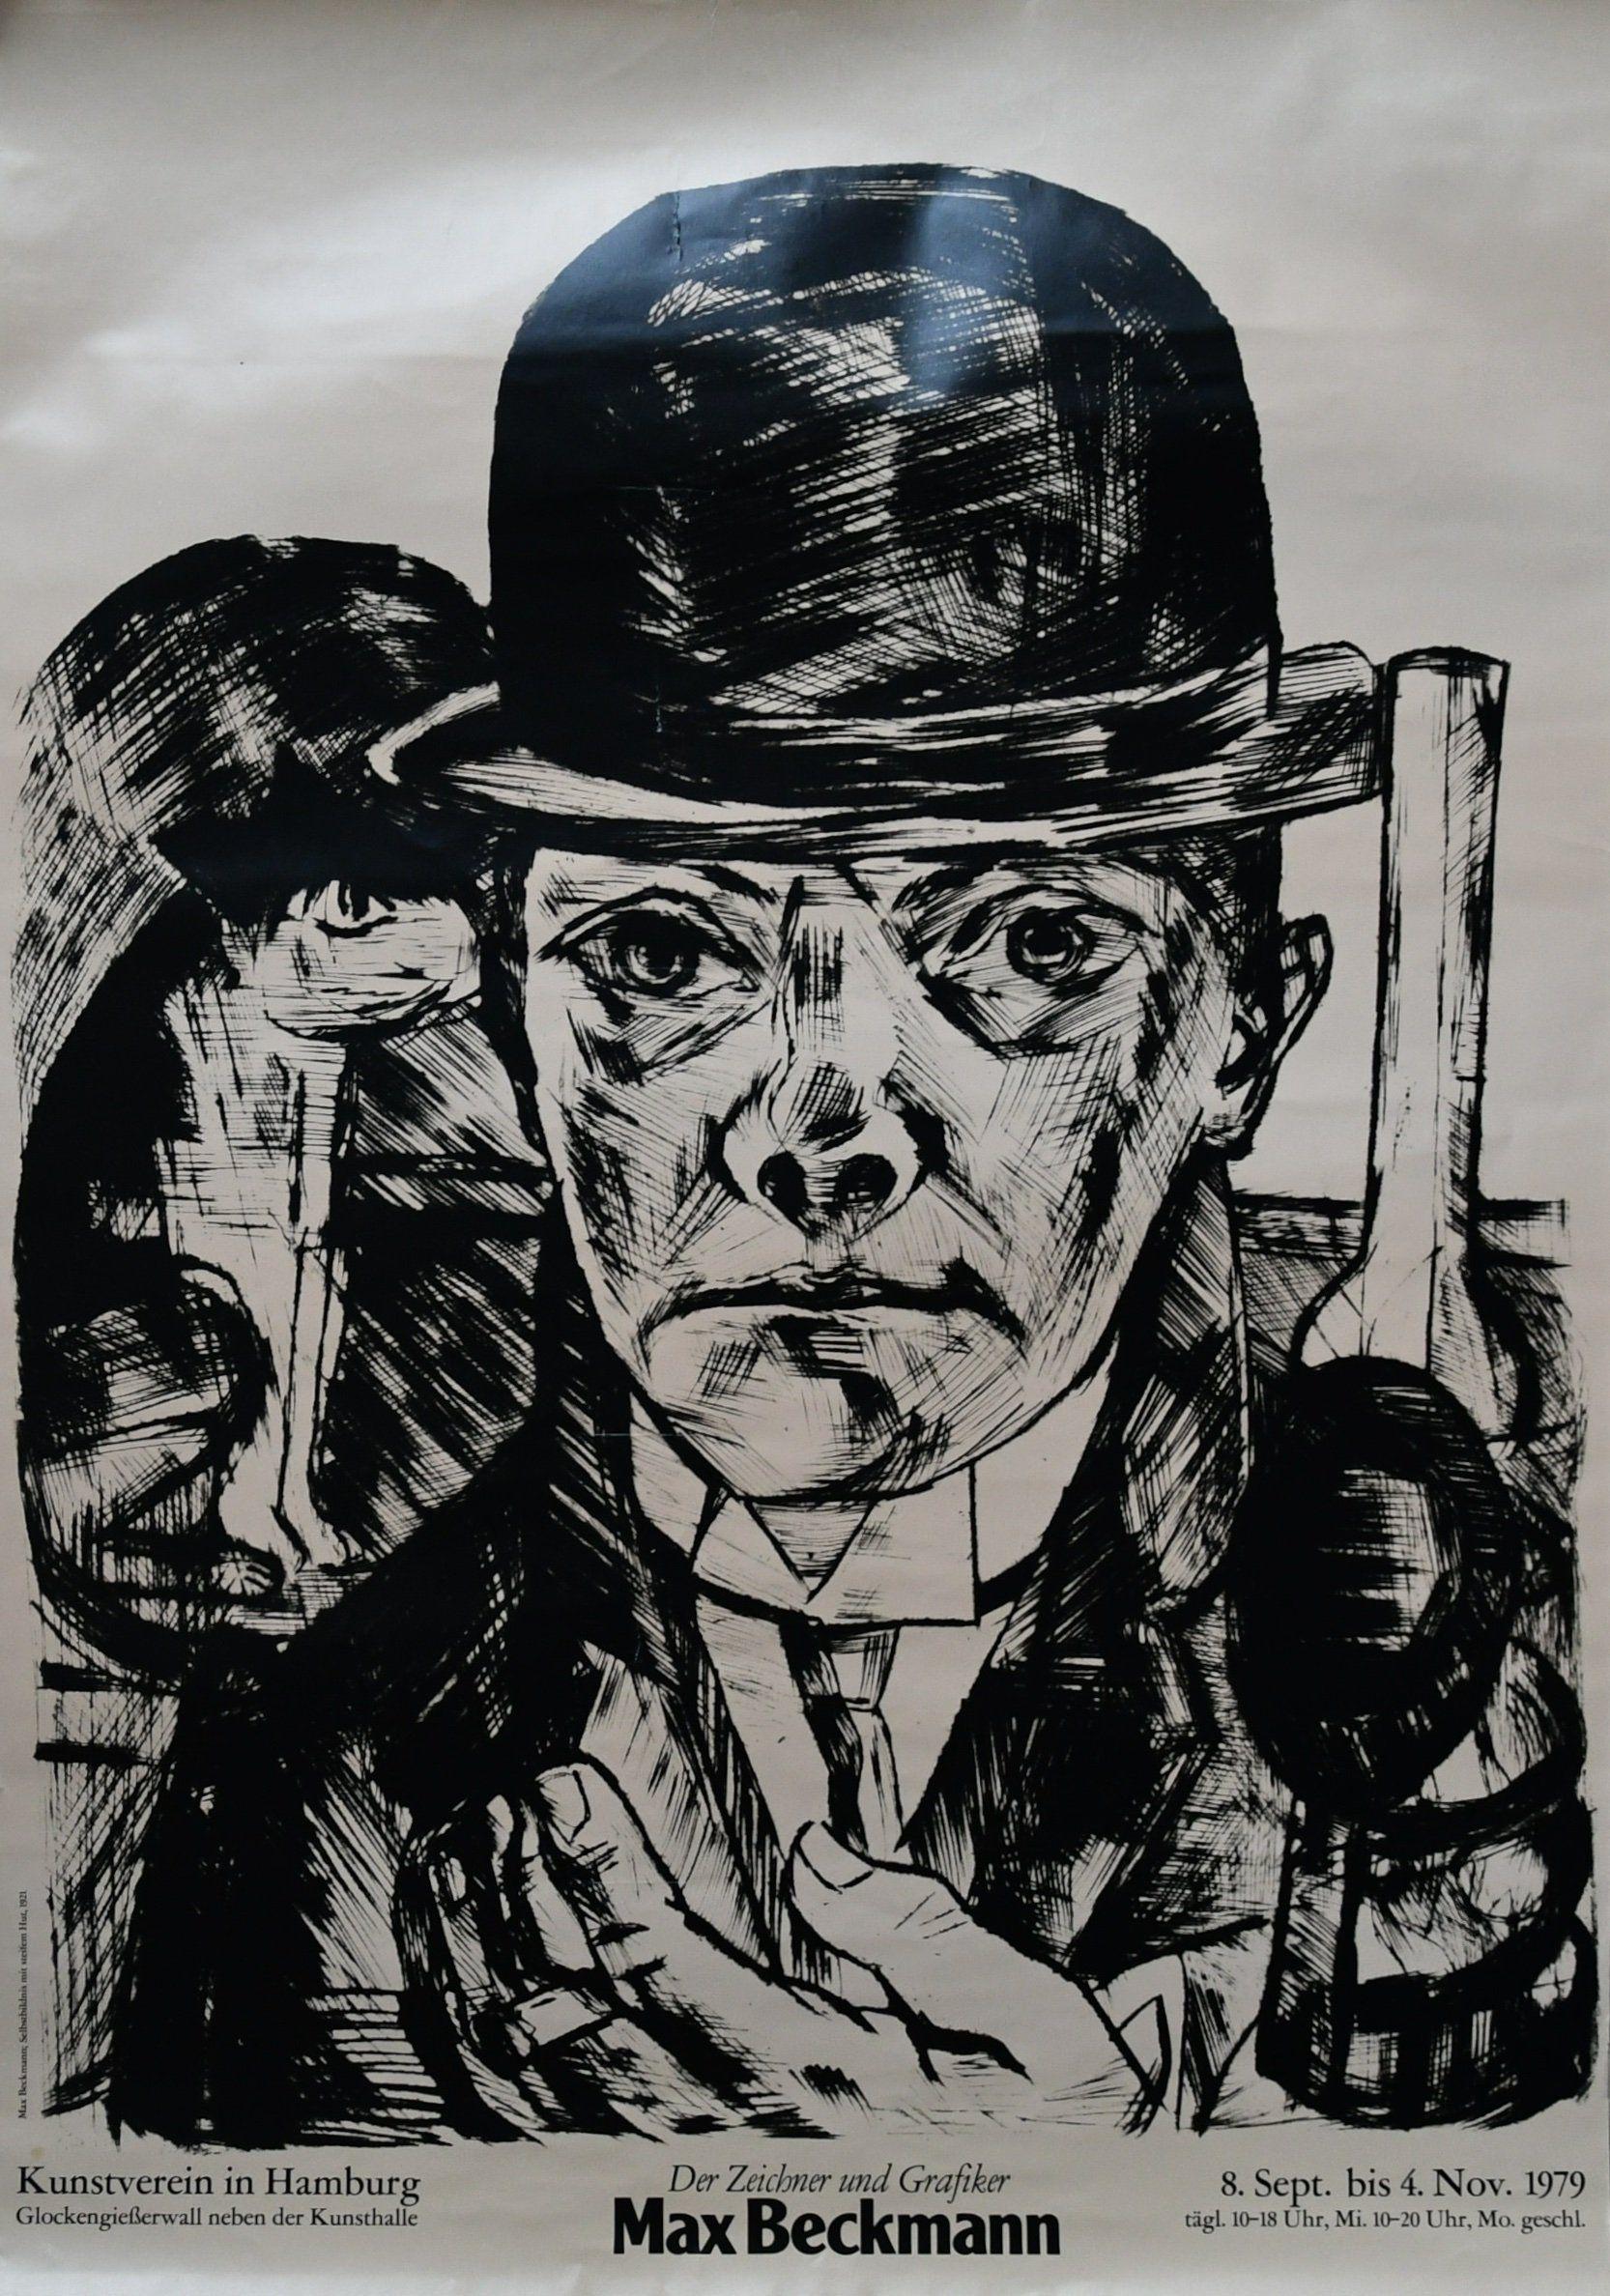 1915 Self-Portrait as a Nurse - Max Beckmann, Verismo